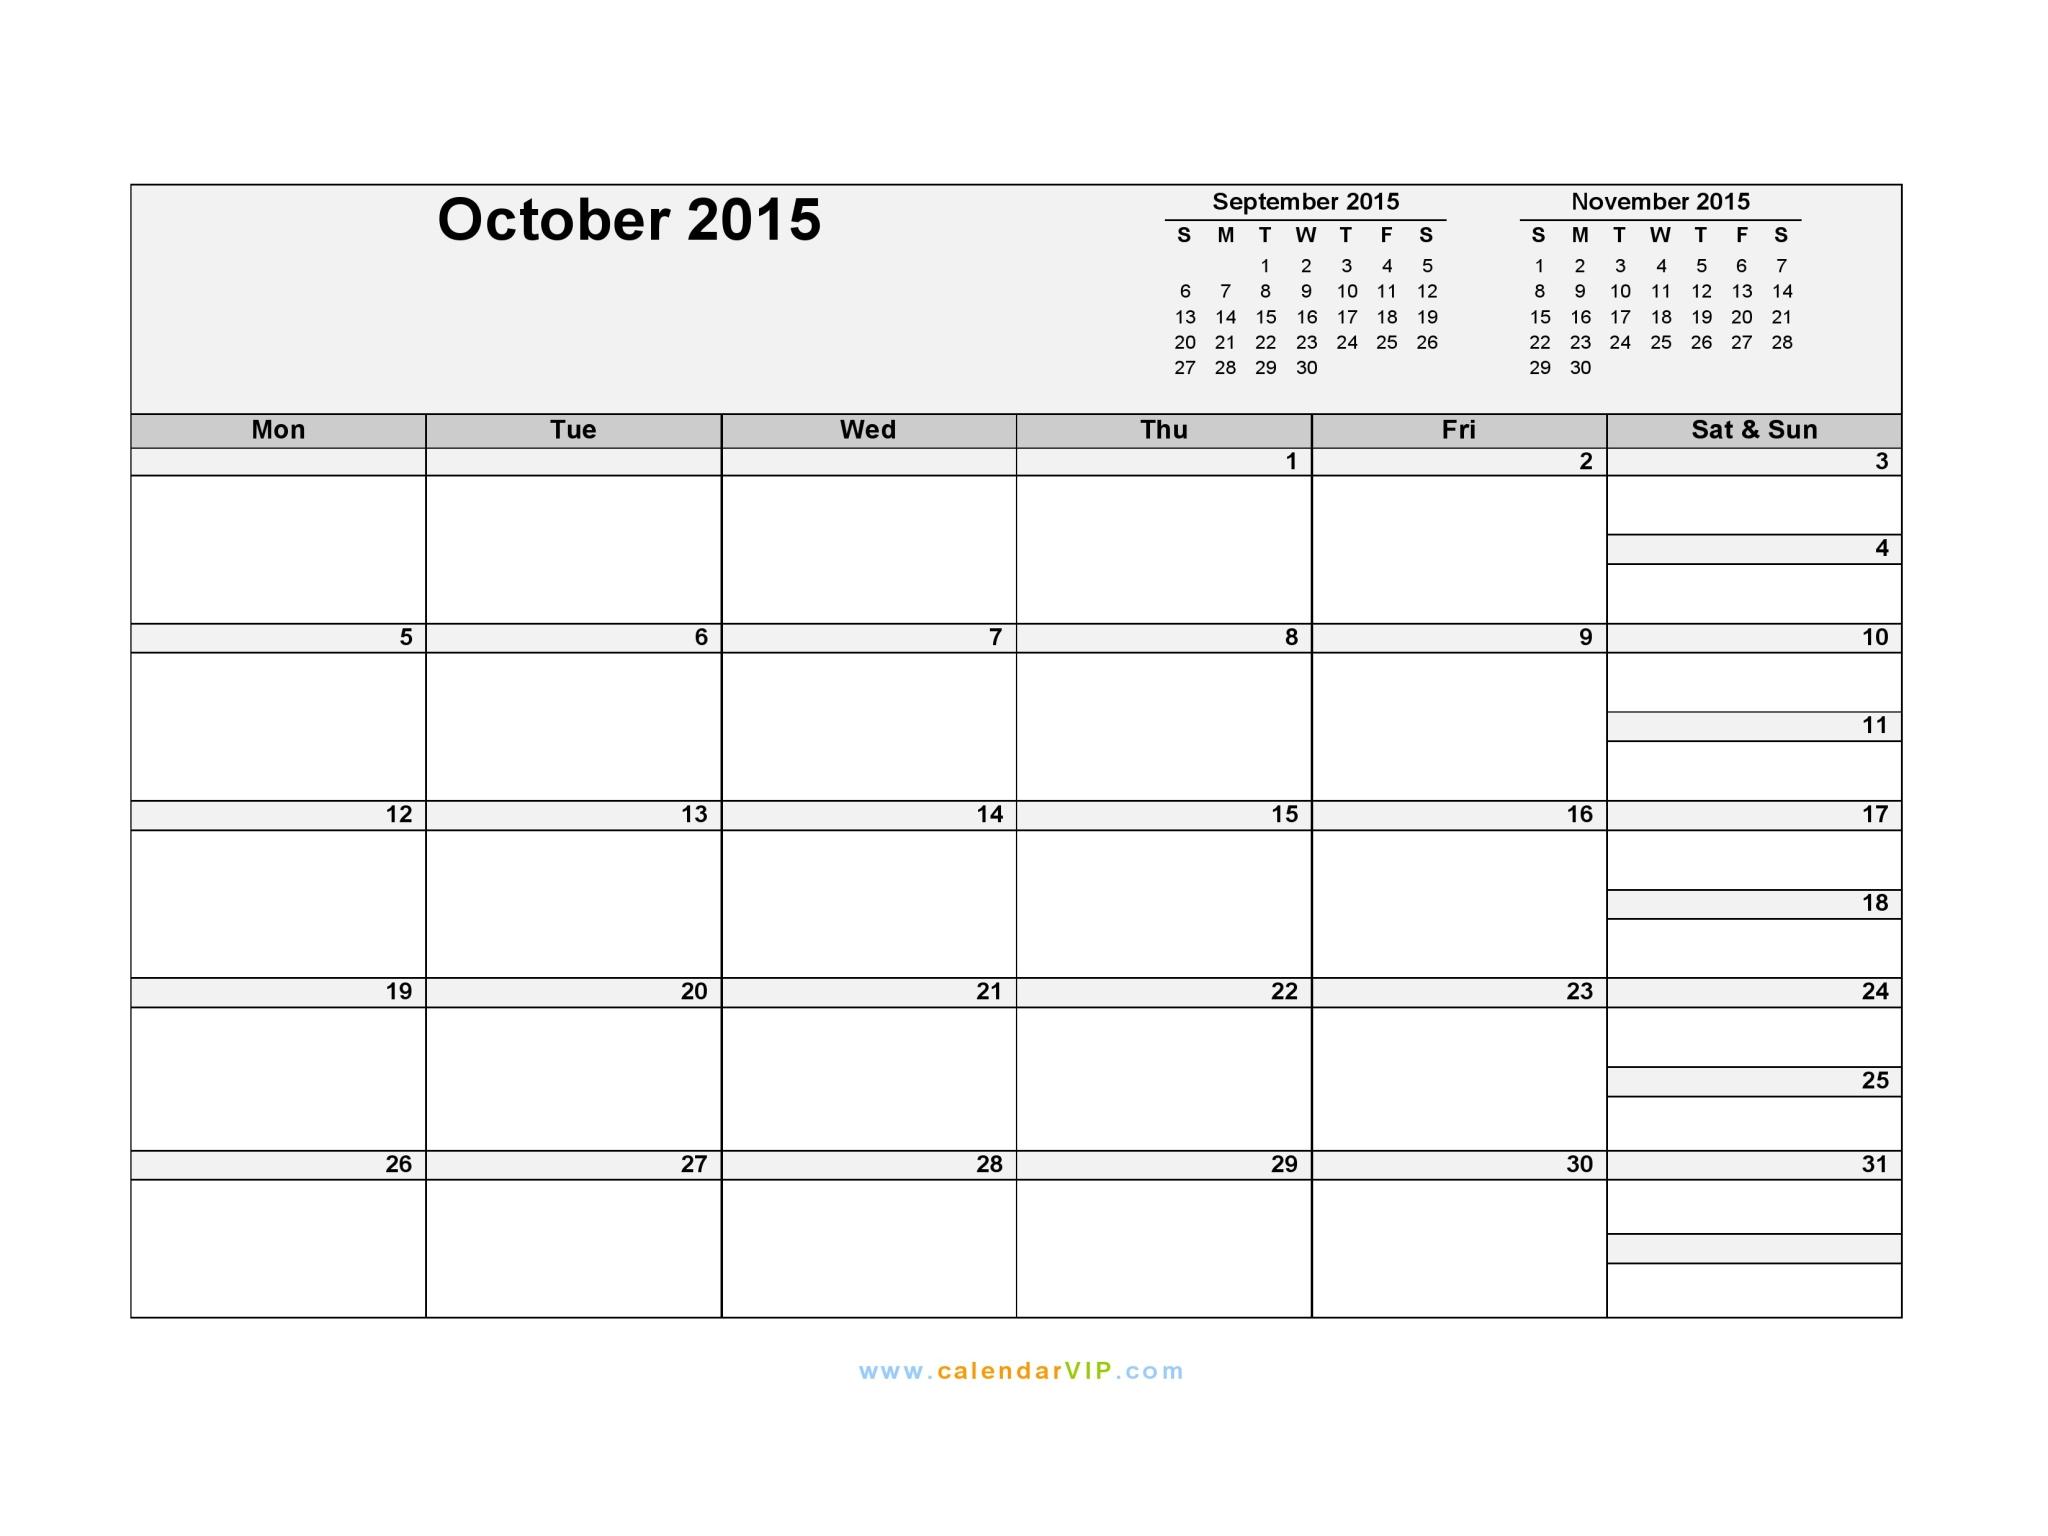 October 2015 Calendar Blank Printable Calendar Template in PDF – Word Template Calendar 2015